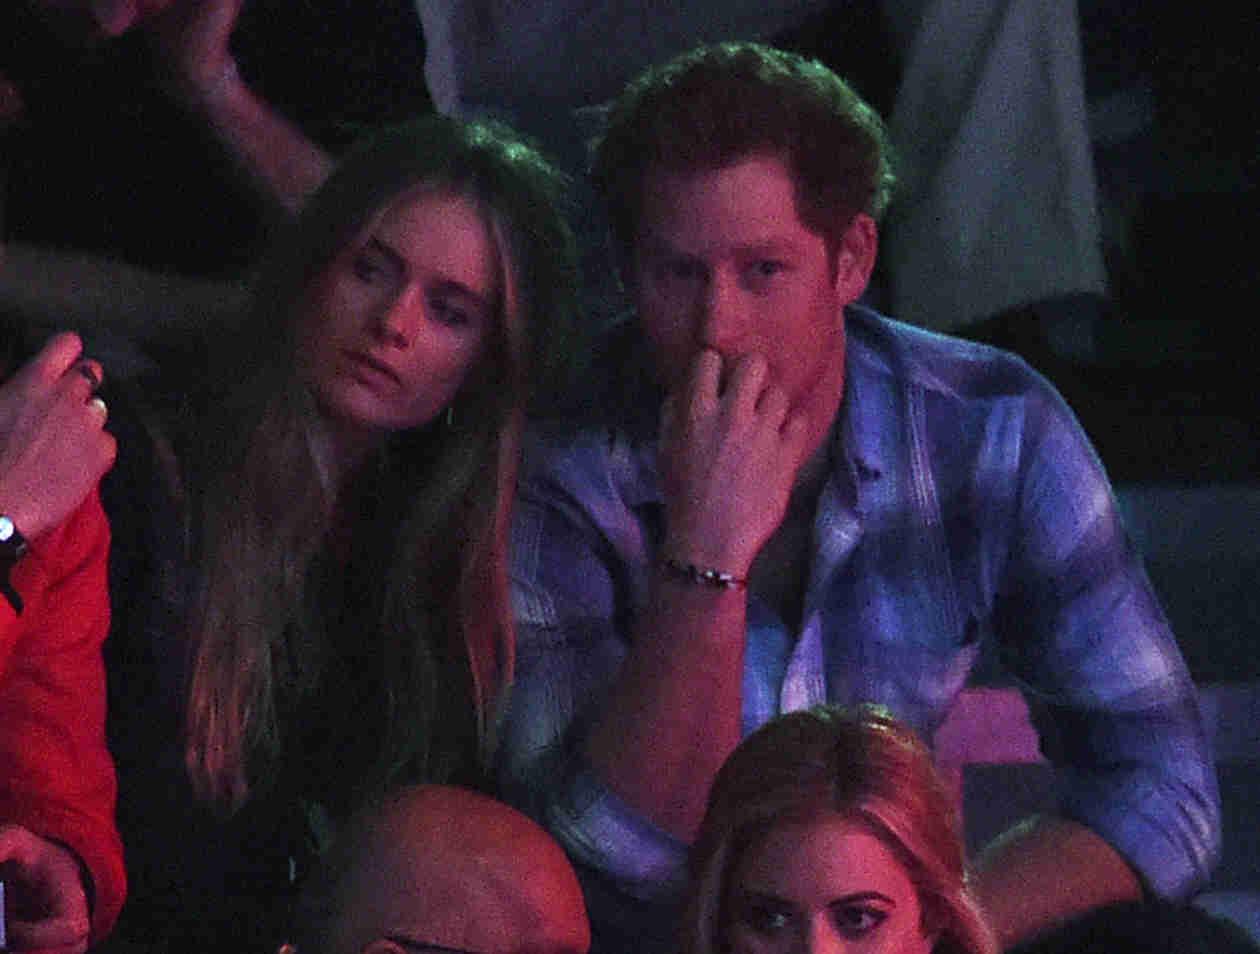 Prince Harry Splits With Cressida Bonas (VIDEO)